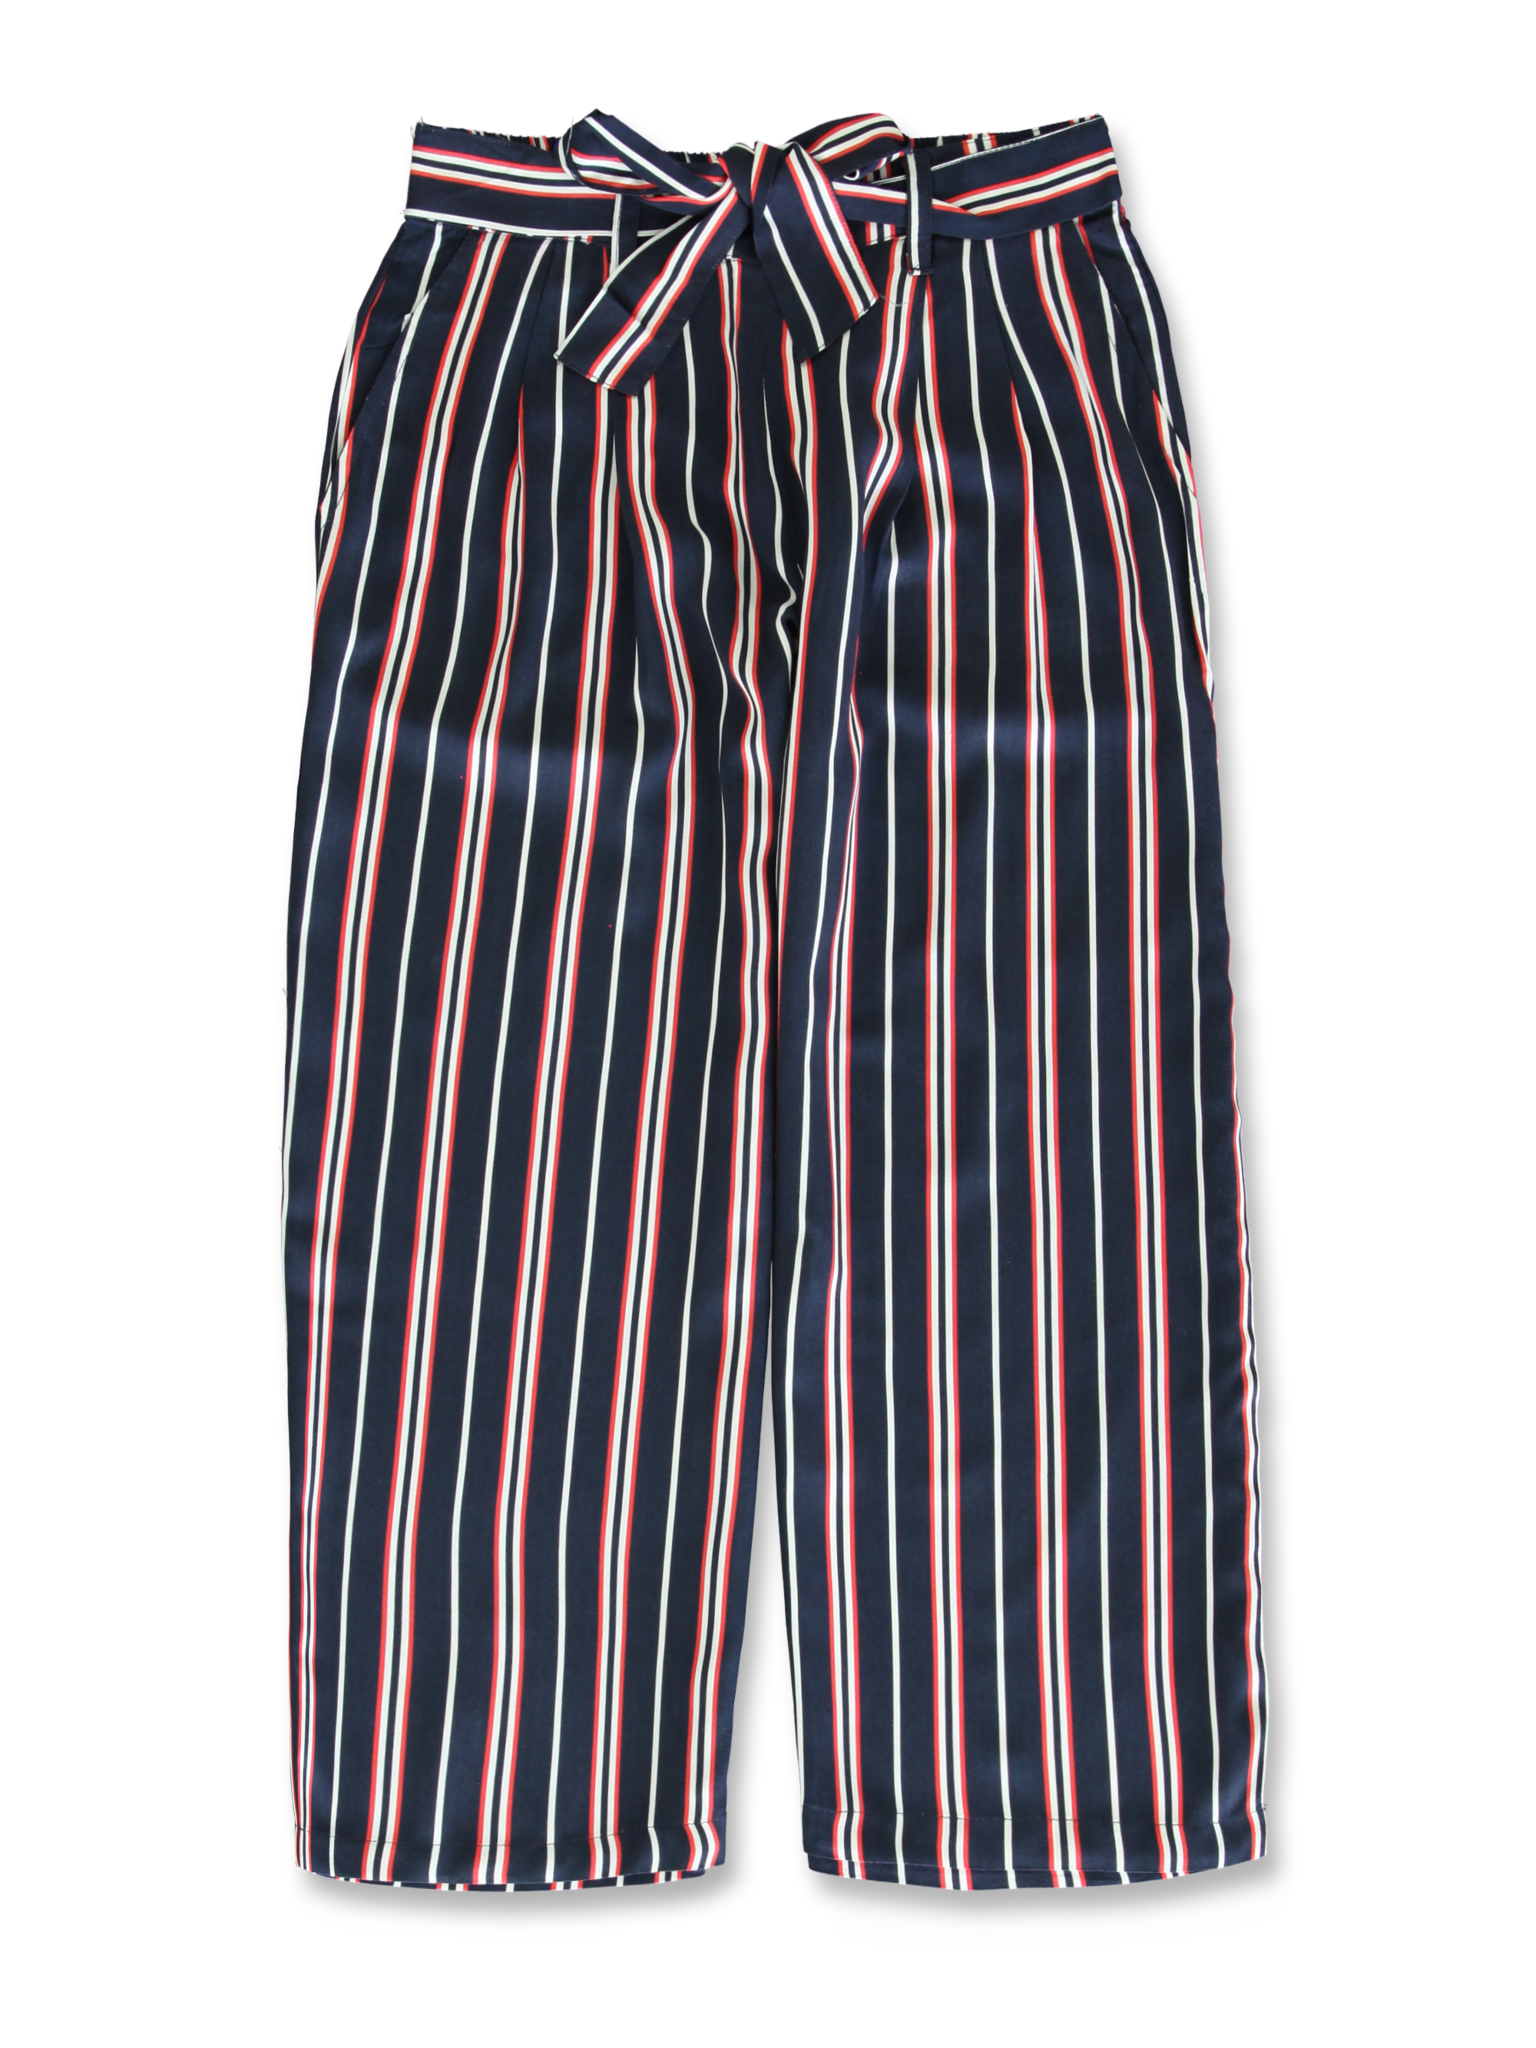 All Brands | Summerproducts Teen Girls | Pants | 10 pcs/box